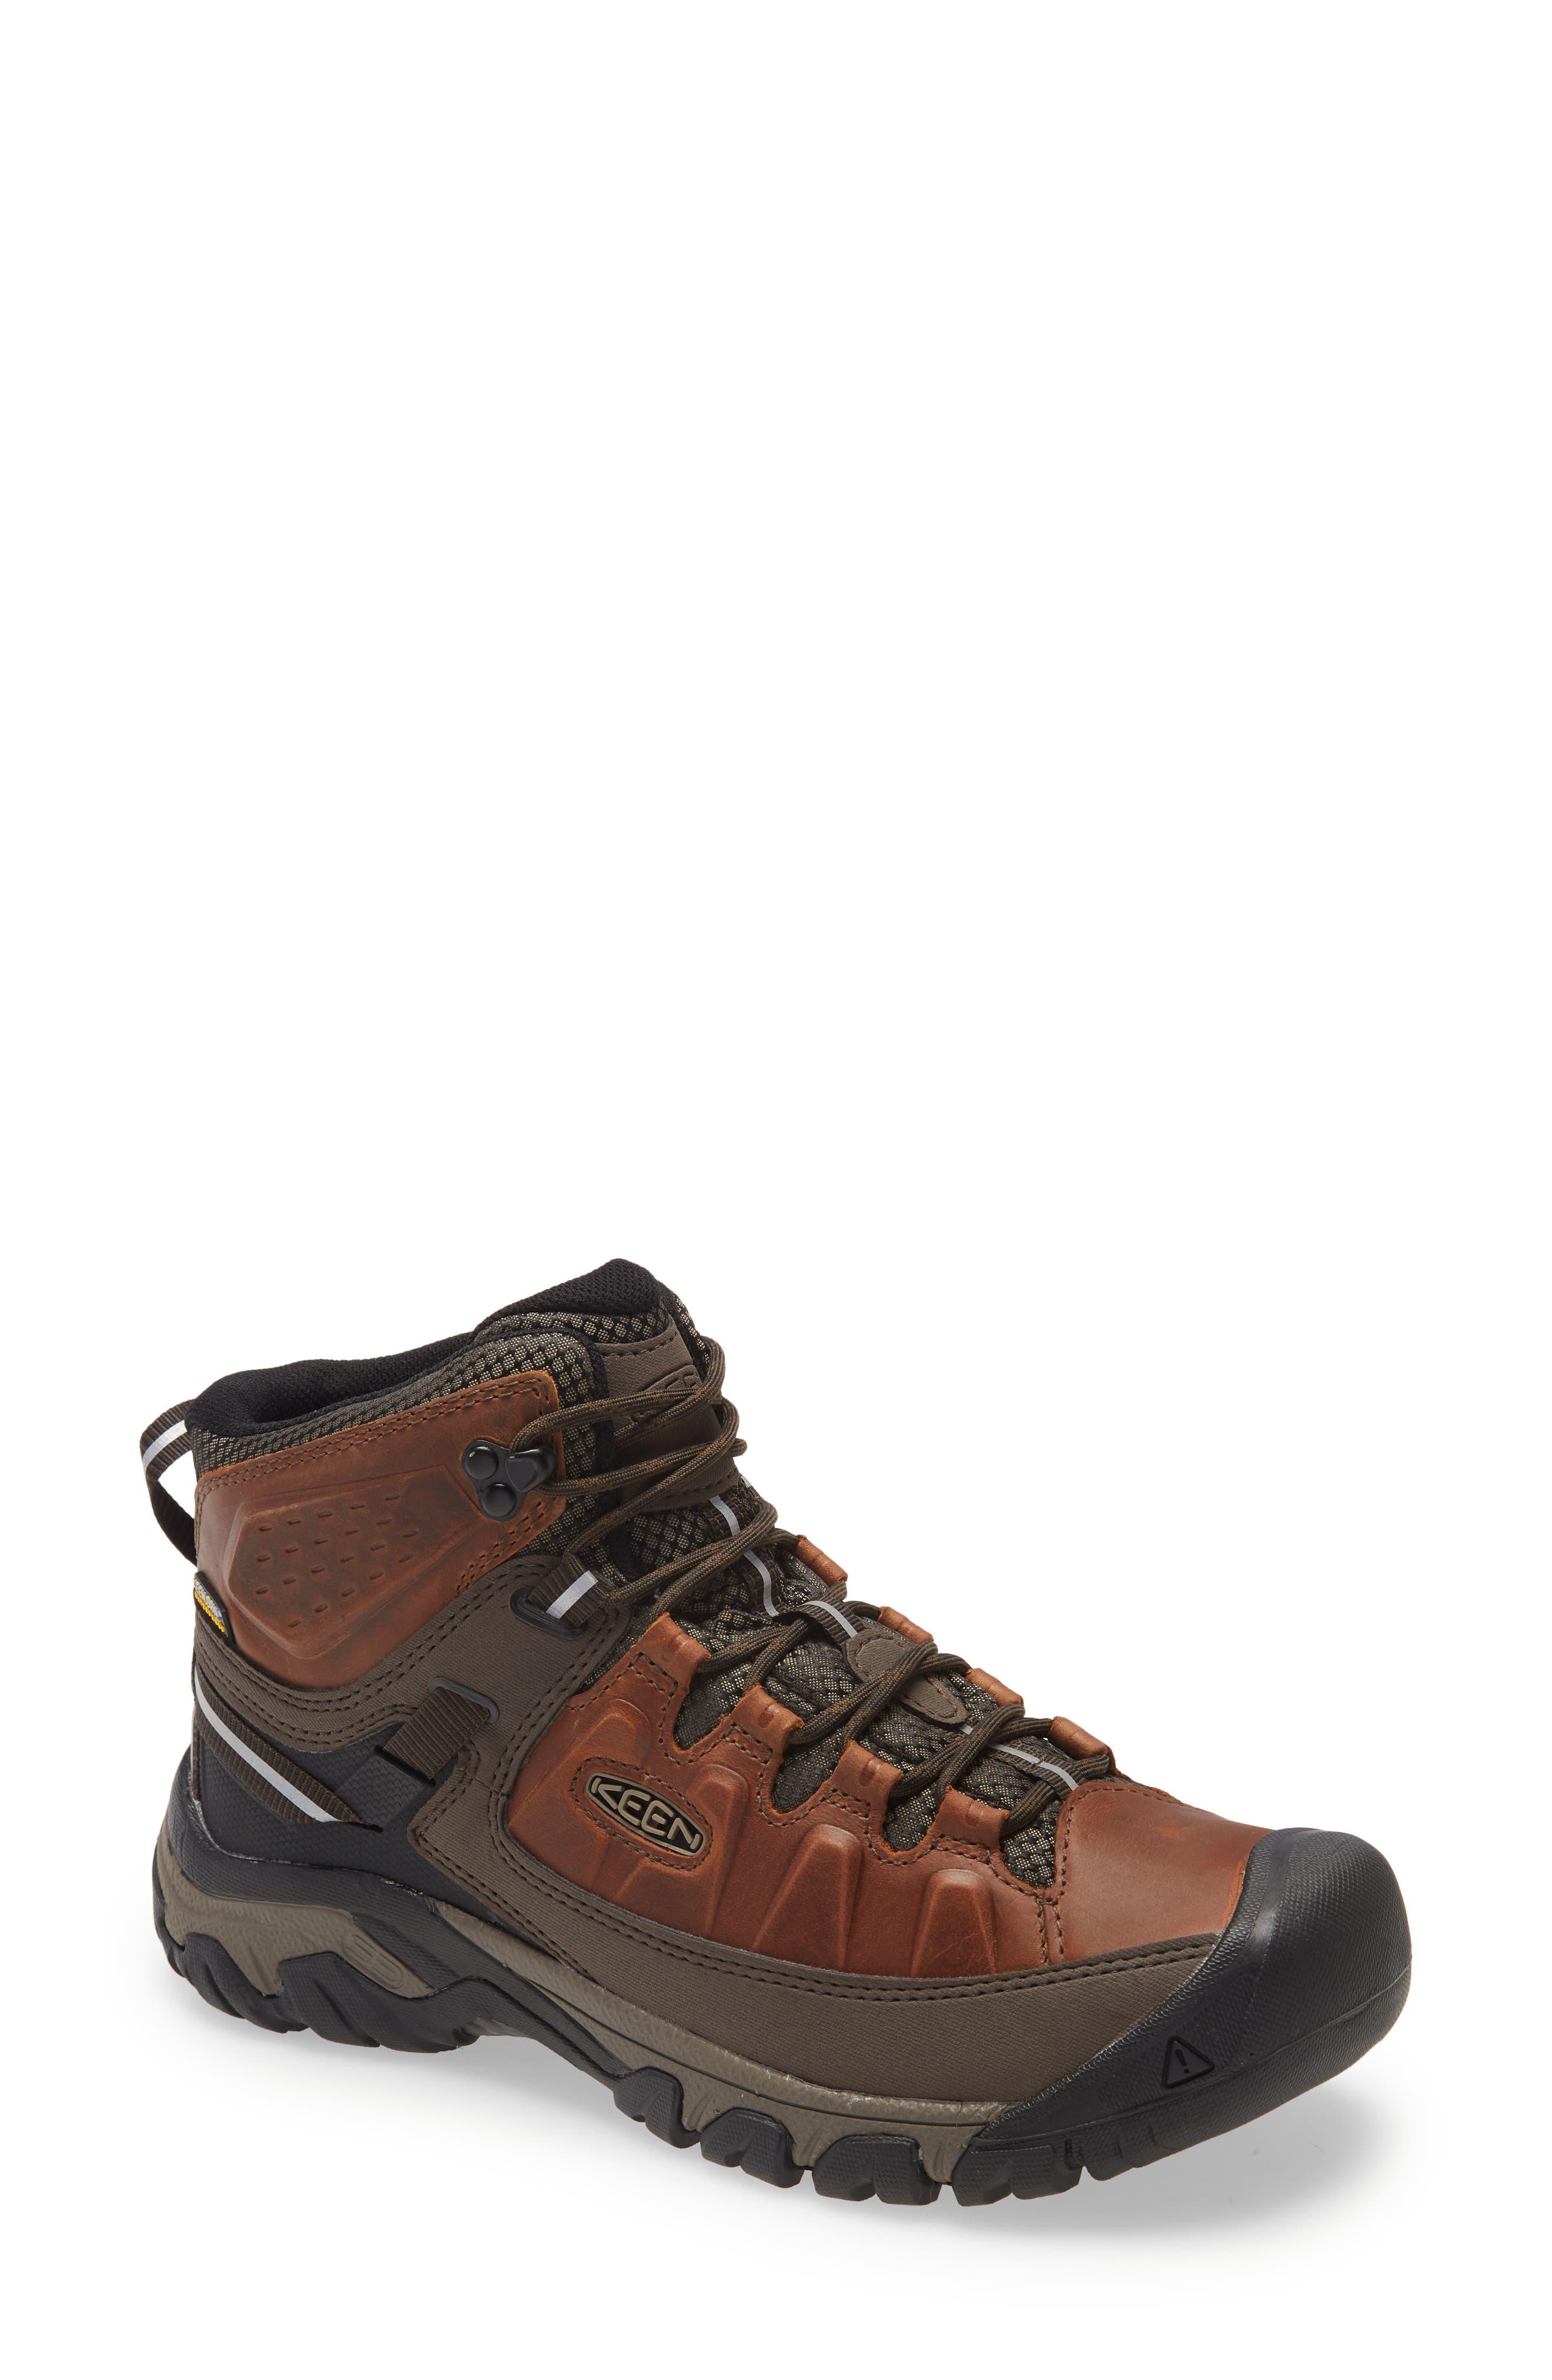 Targhee Iii Mid Waterproof Hiking Boot